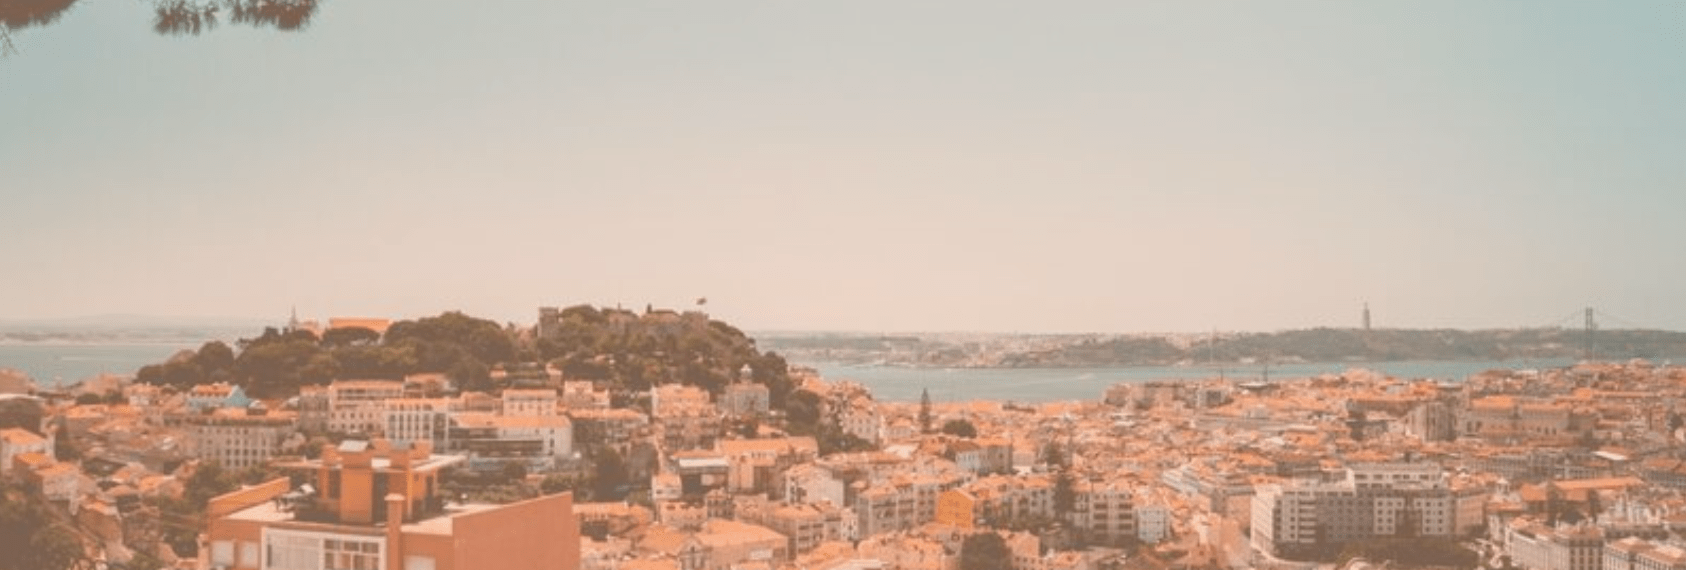 Lisbon Portugal tech city